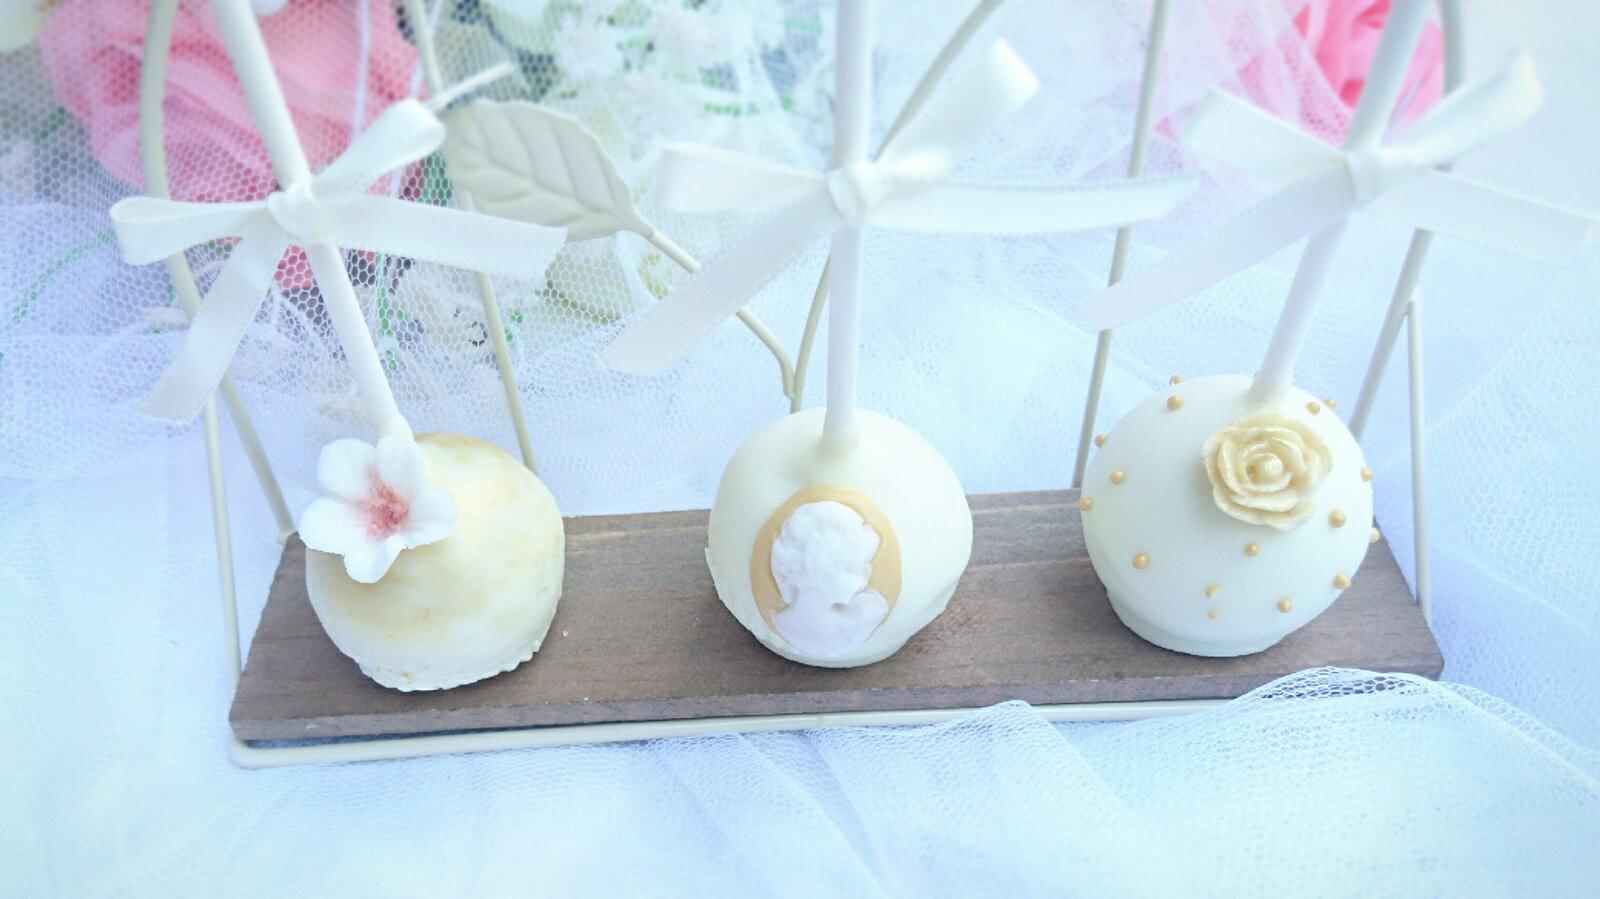 【Miss Cat】白金系列低調奢華布朗尼棒蛋糕、婚禮必備(10對20支) 0